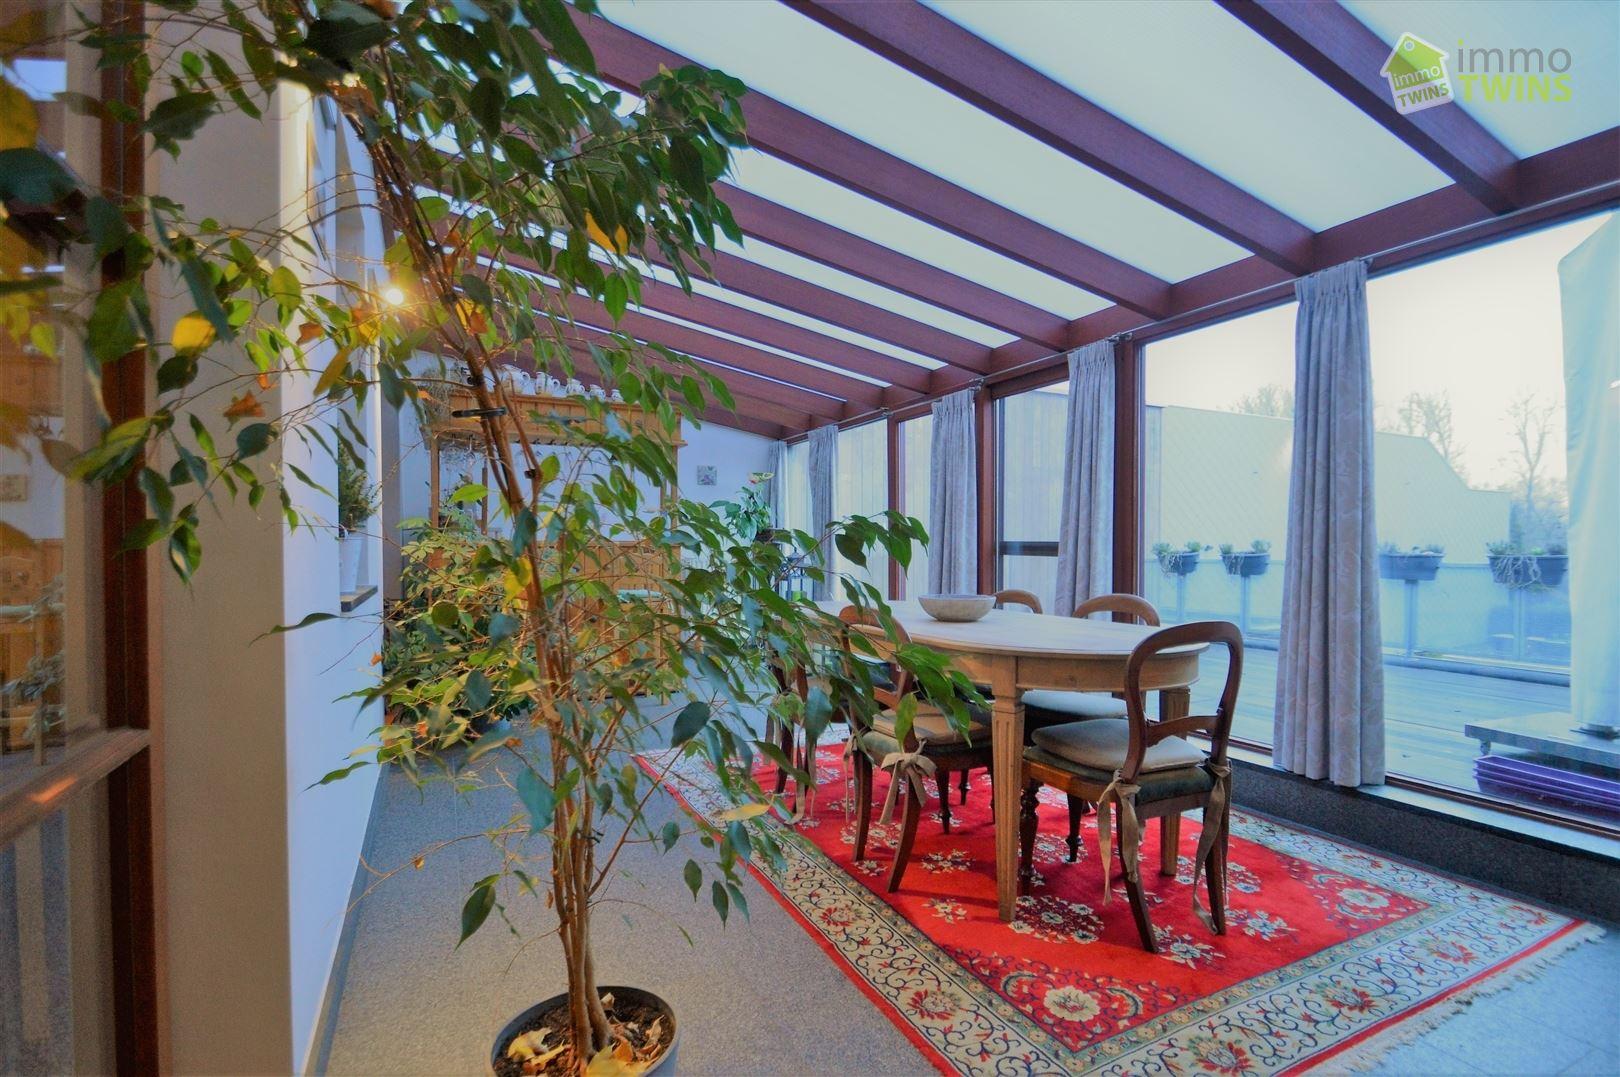 Foto 8 : Duplex/Penthouse te 2890 SINT-AMANDS (België) - Prijs € 429.000